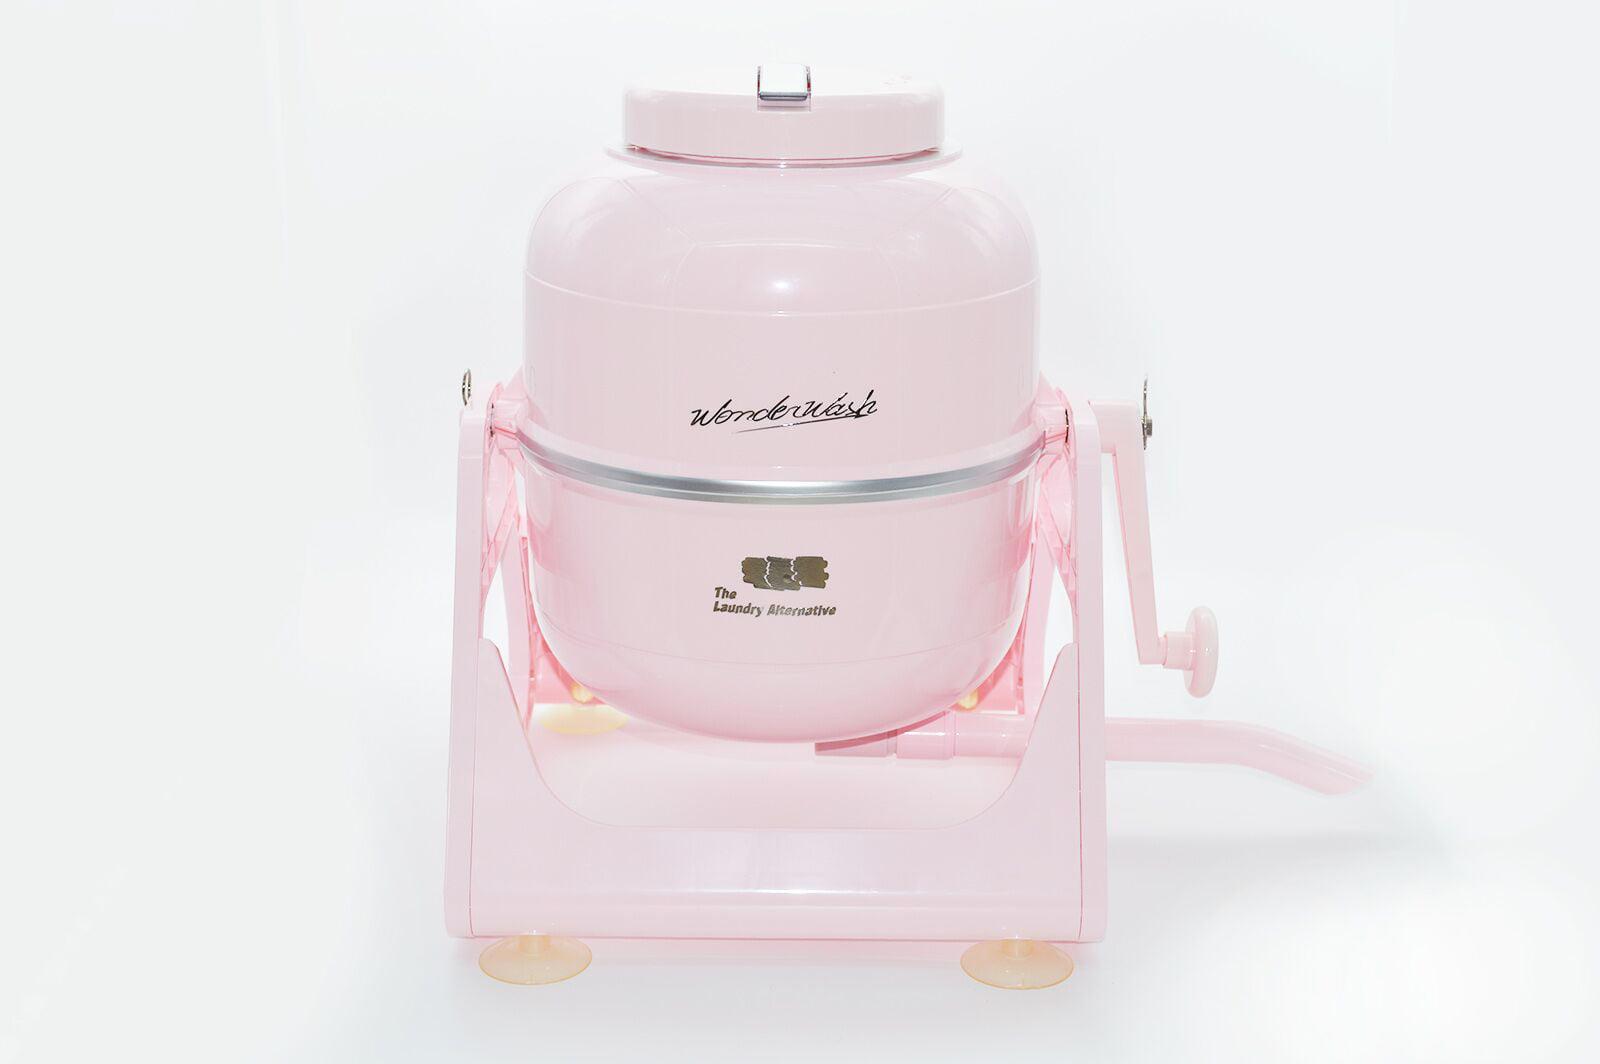 Pink The Laundry Alternative Wonderwash Retro Colors Non-electric Portable Compact Mini Washing Machine